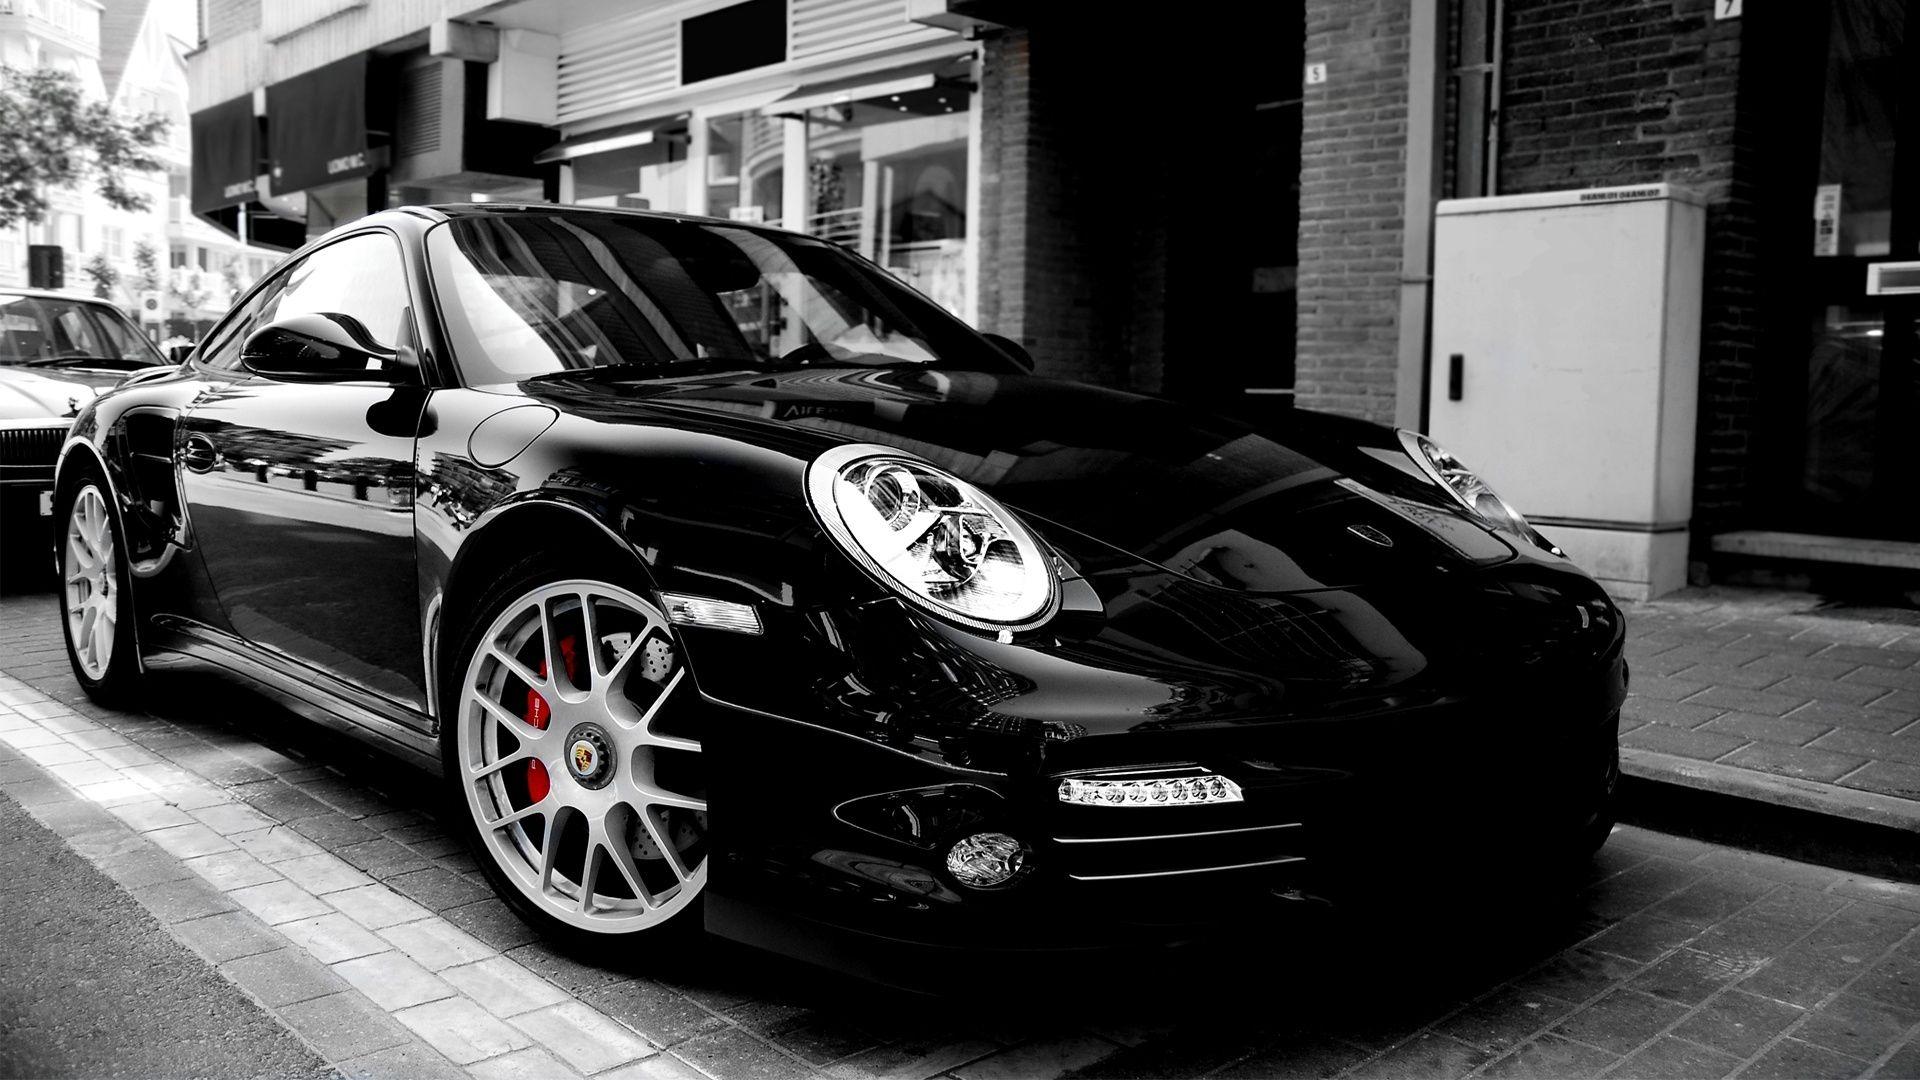 Hd Porsche Wallpapers Porsche 997 Turbo Black Porsche Car Wallpapers